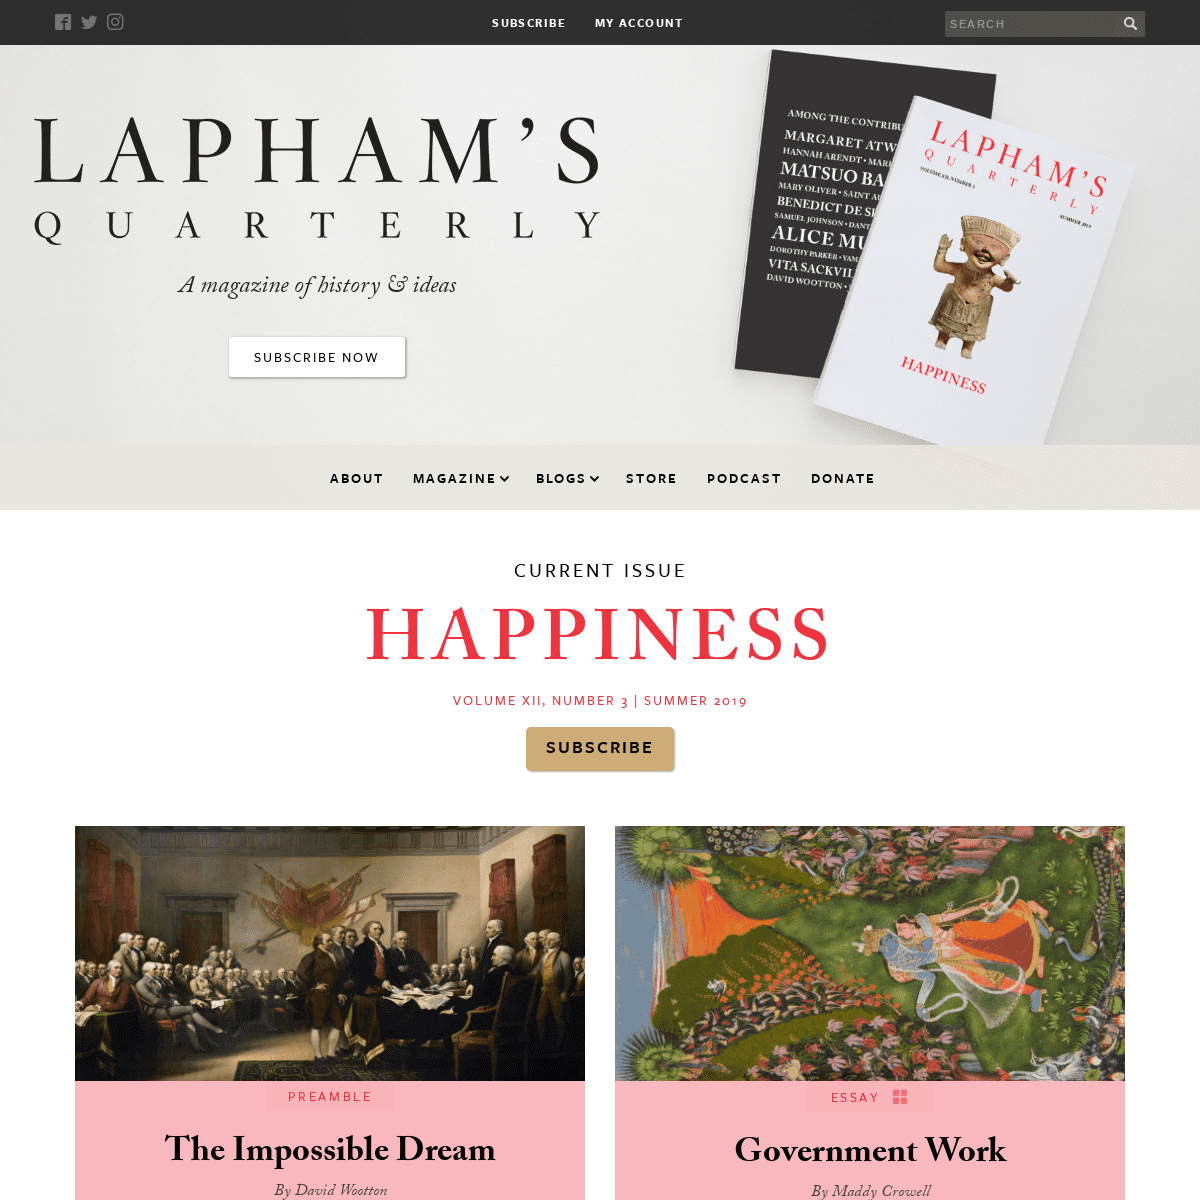 ArchiveBay.com - laphamsquarterly.org - Lapham's Quarterly